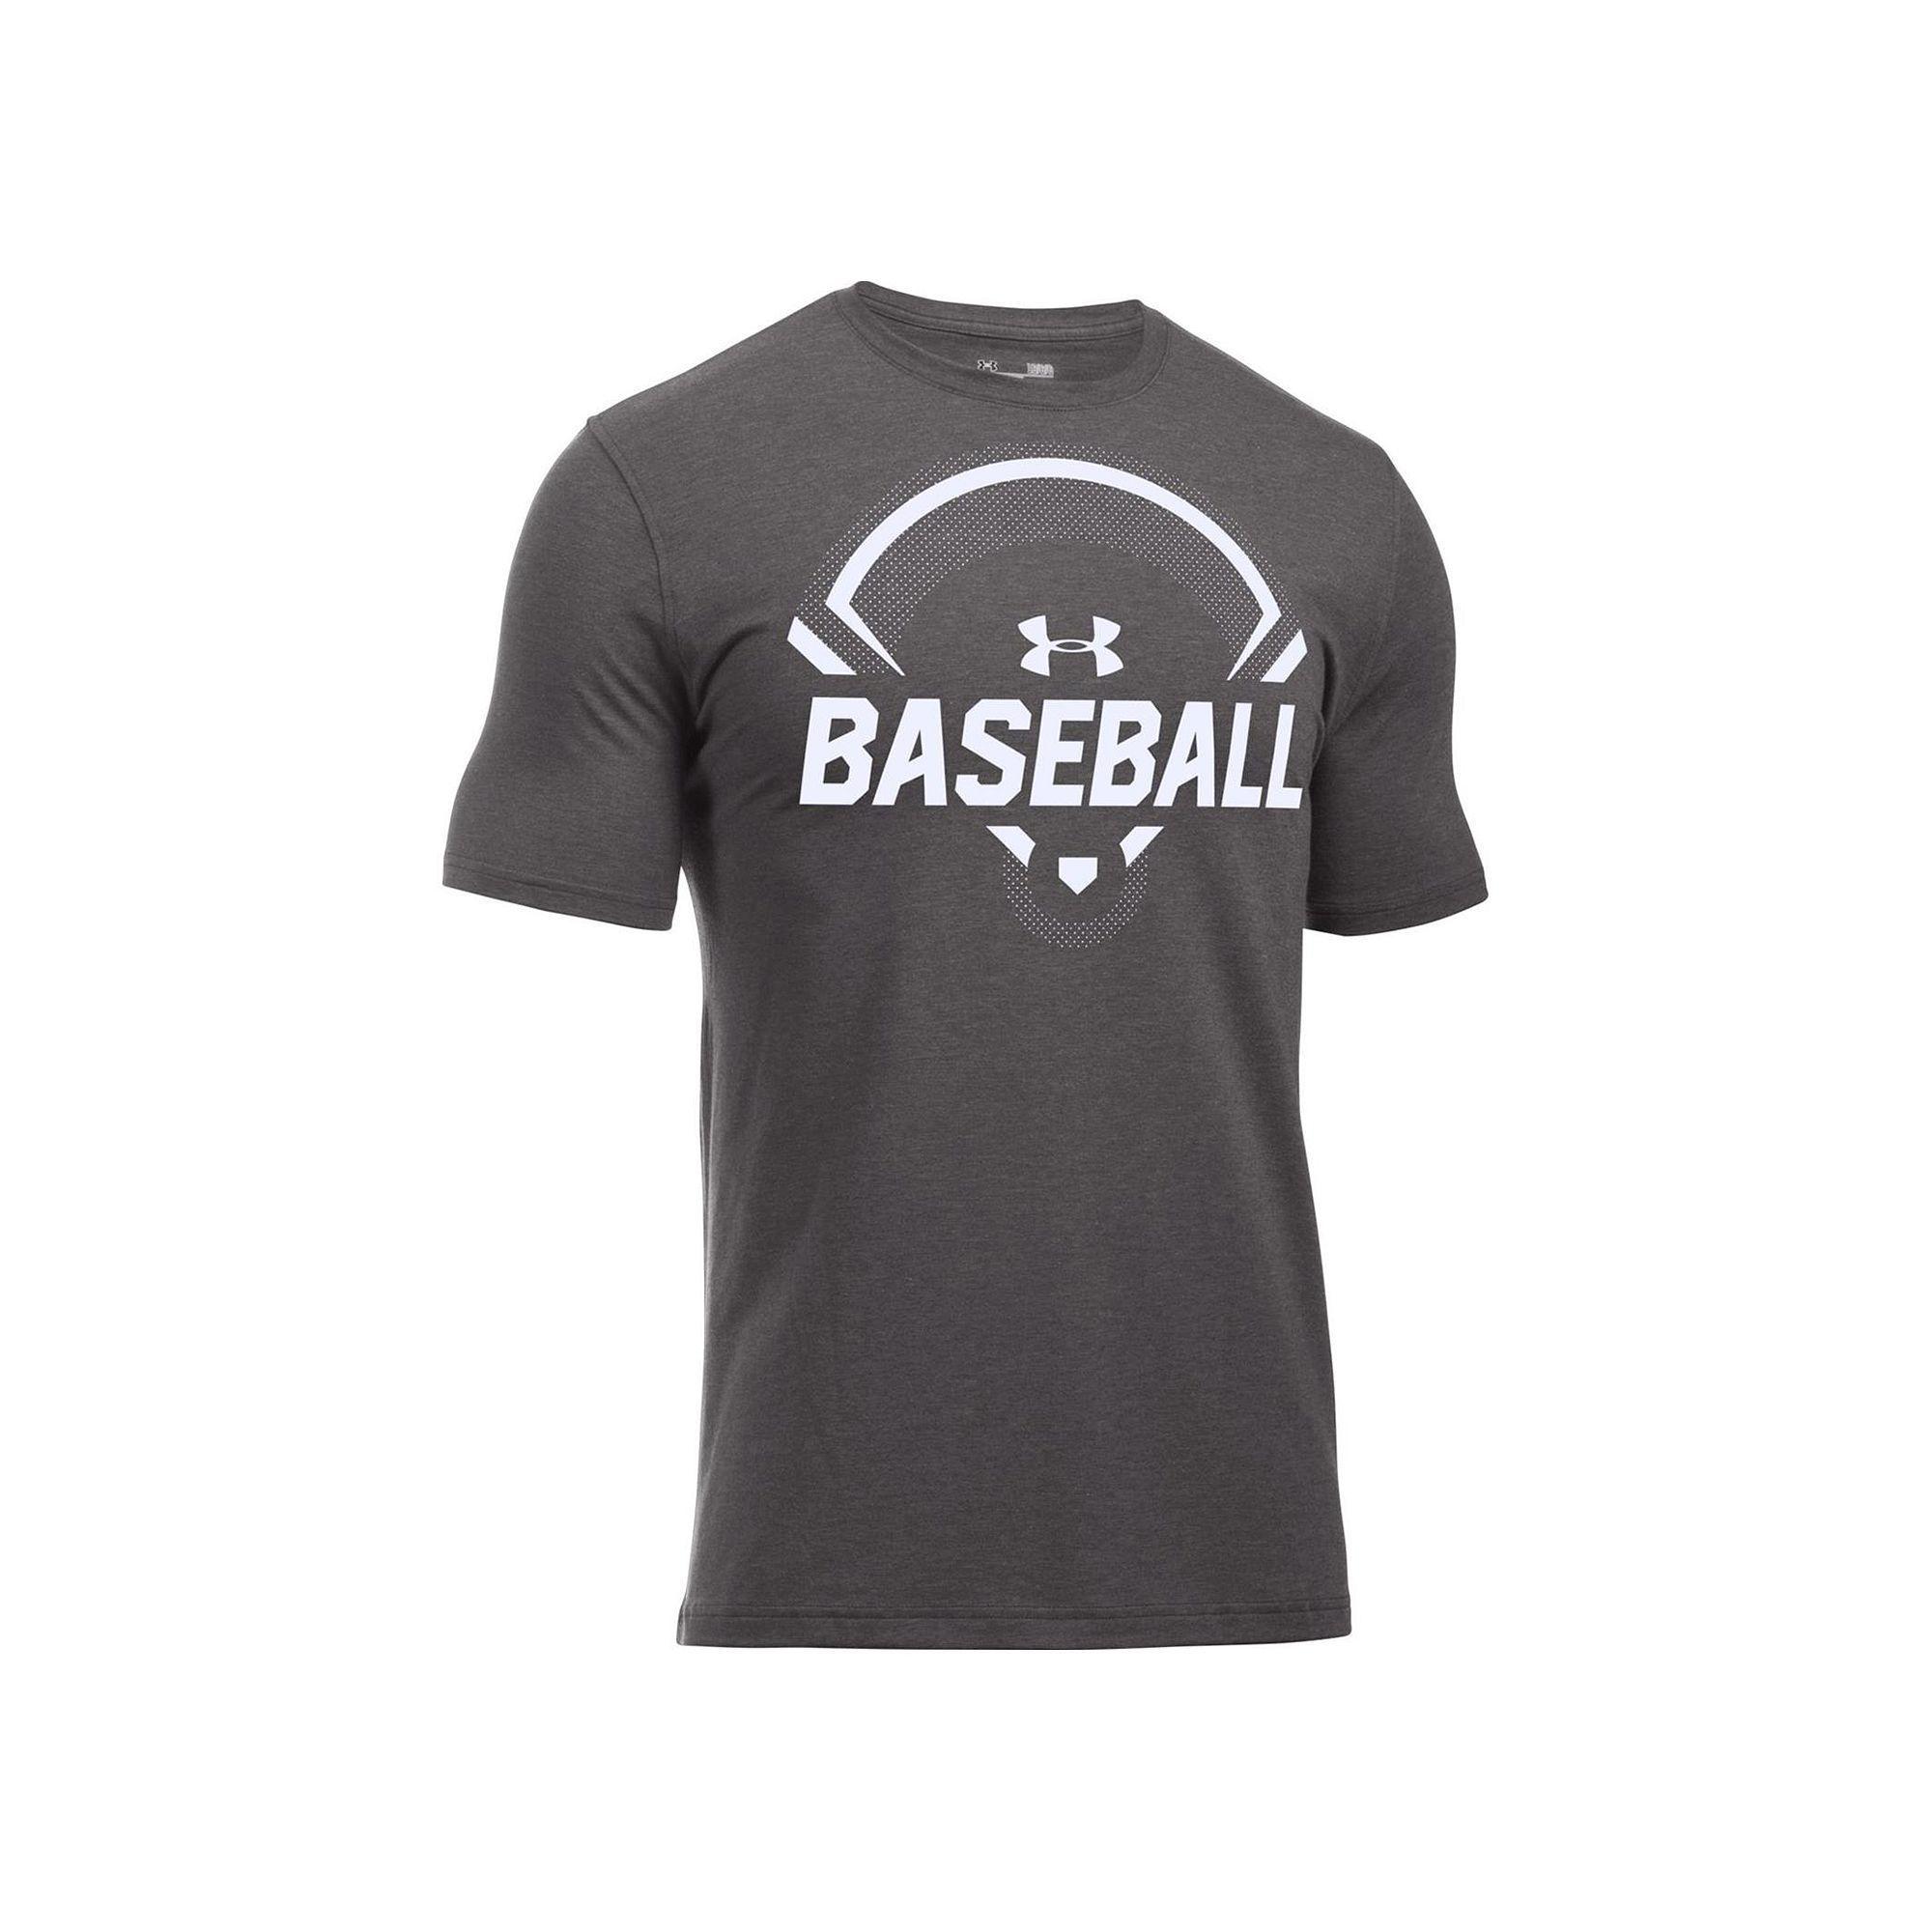 aacc3b29 Men's Under Armour Baseball Diamond Tee | Products | Baseball shirts ...